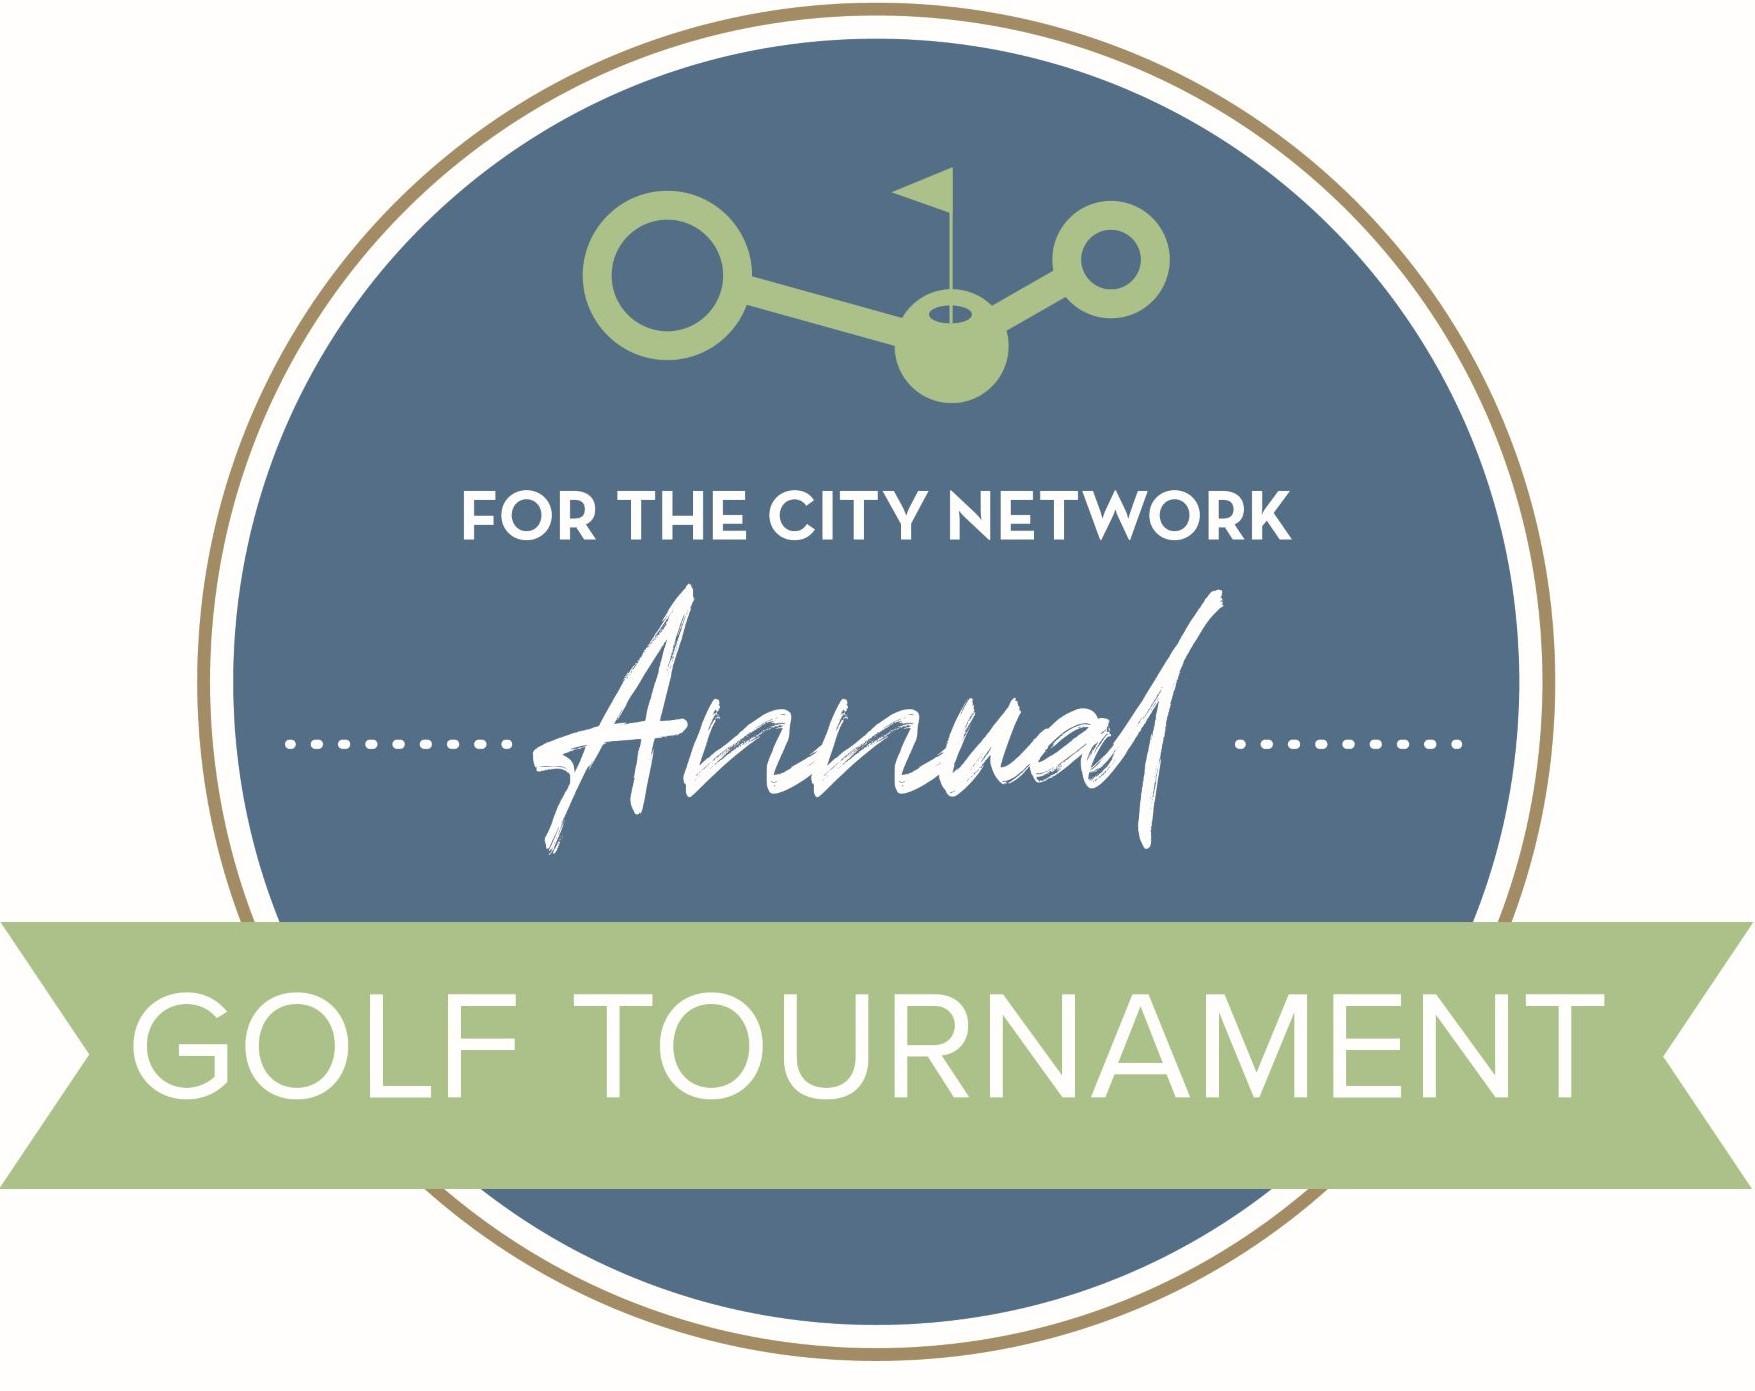 For the City Network Golf Tournament logo